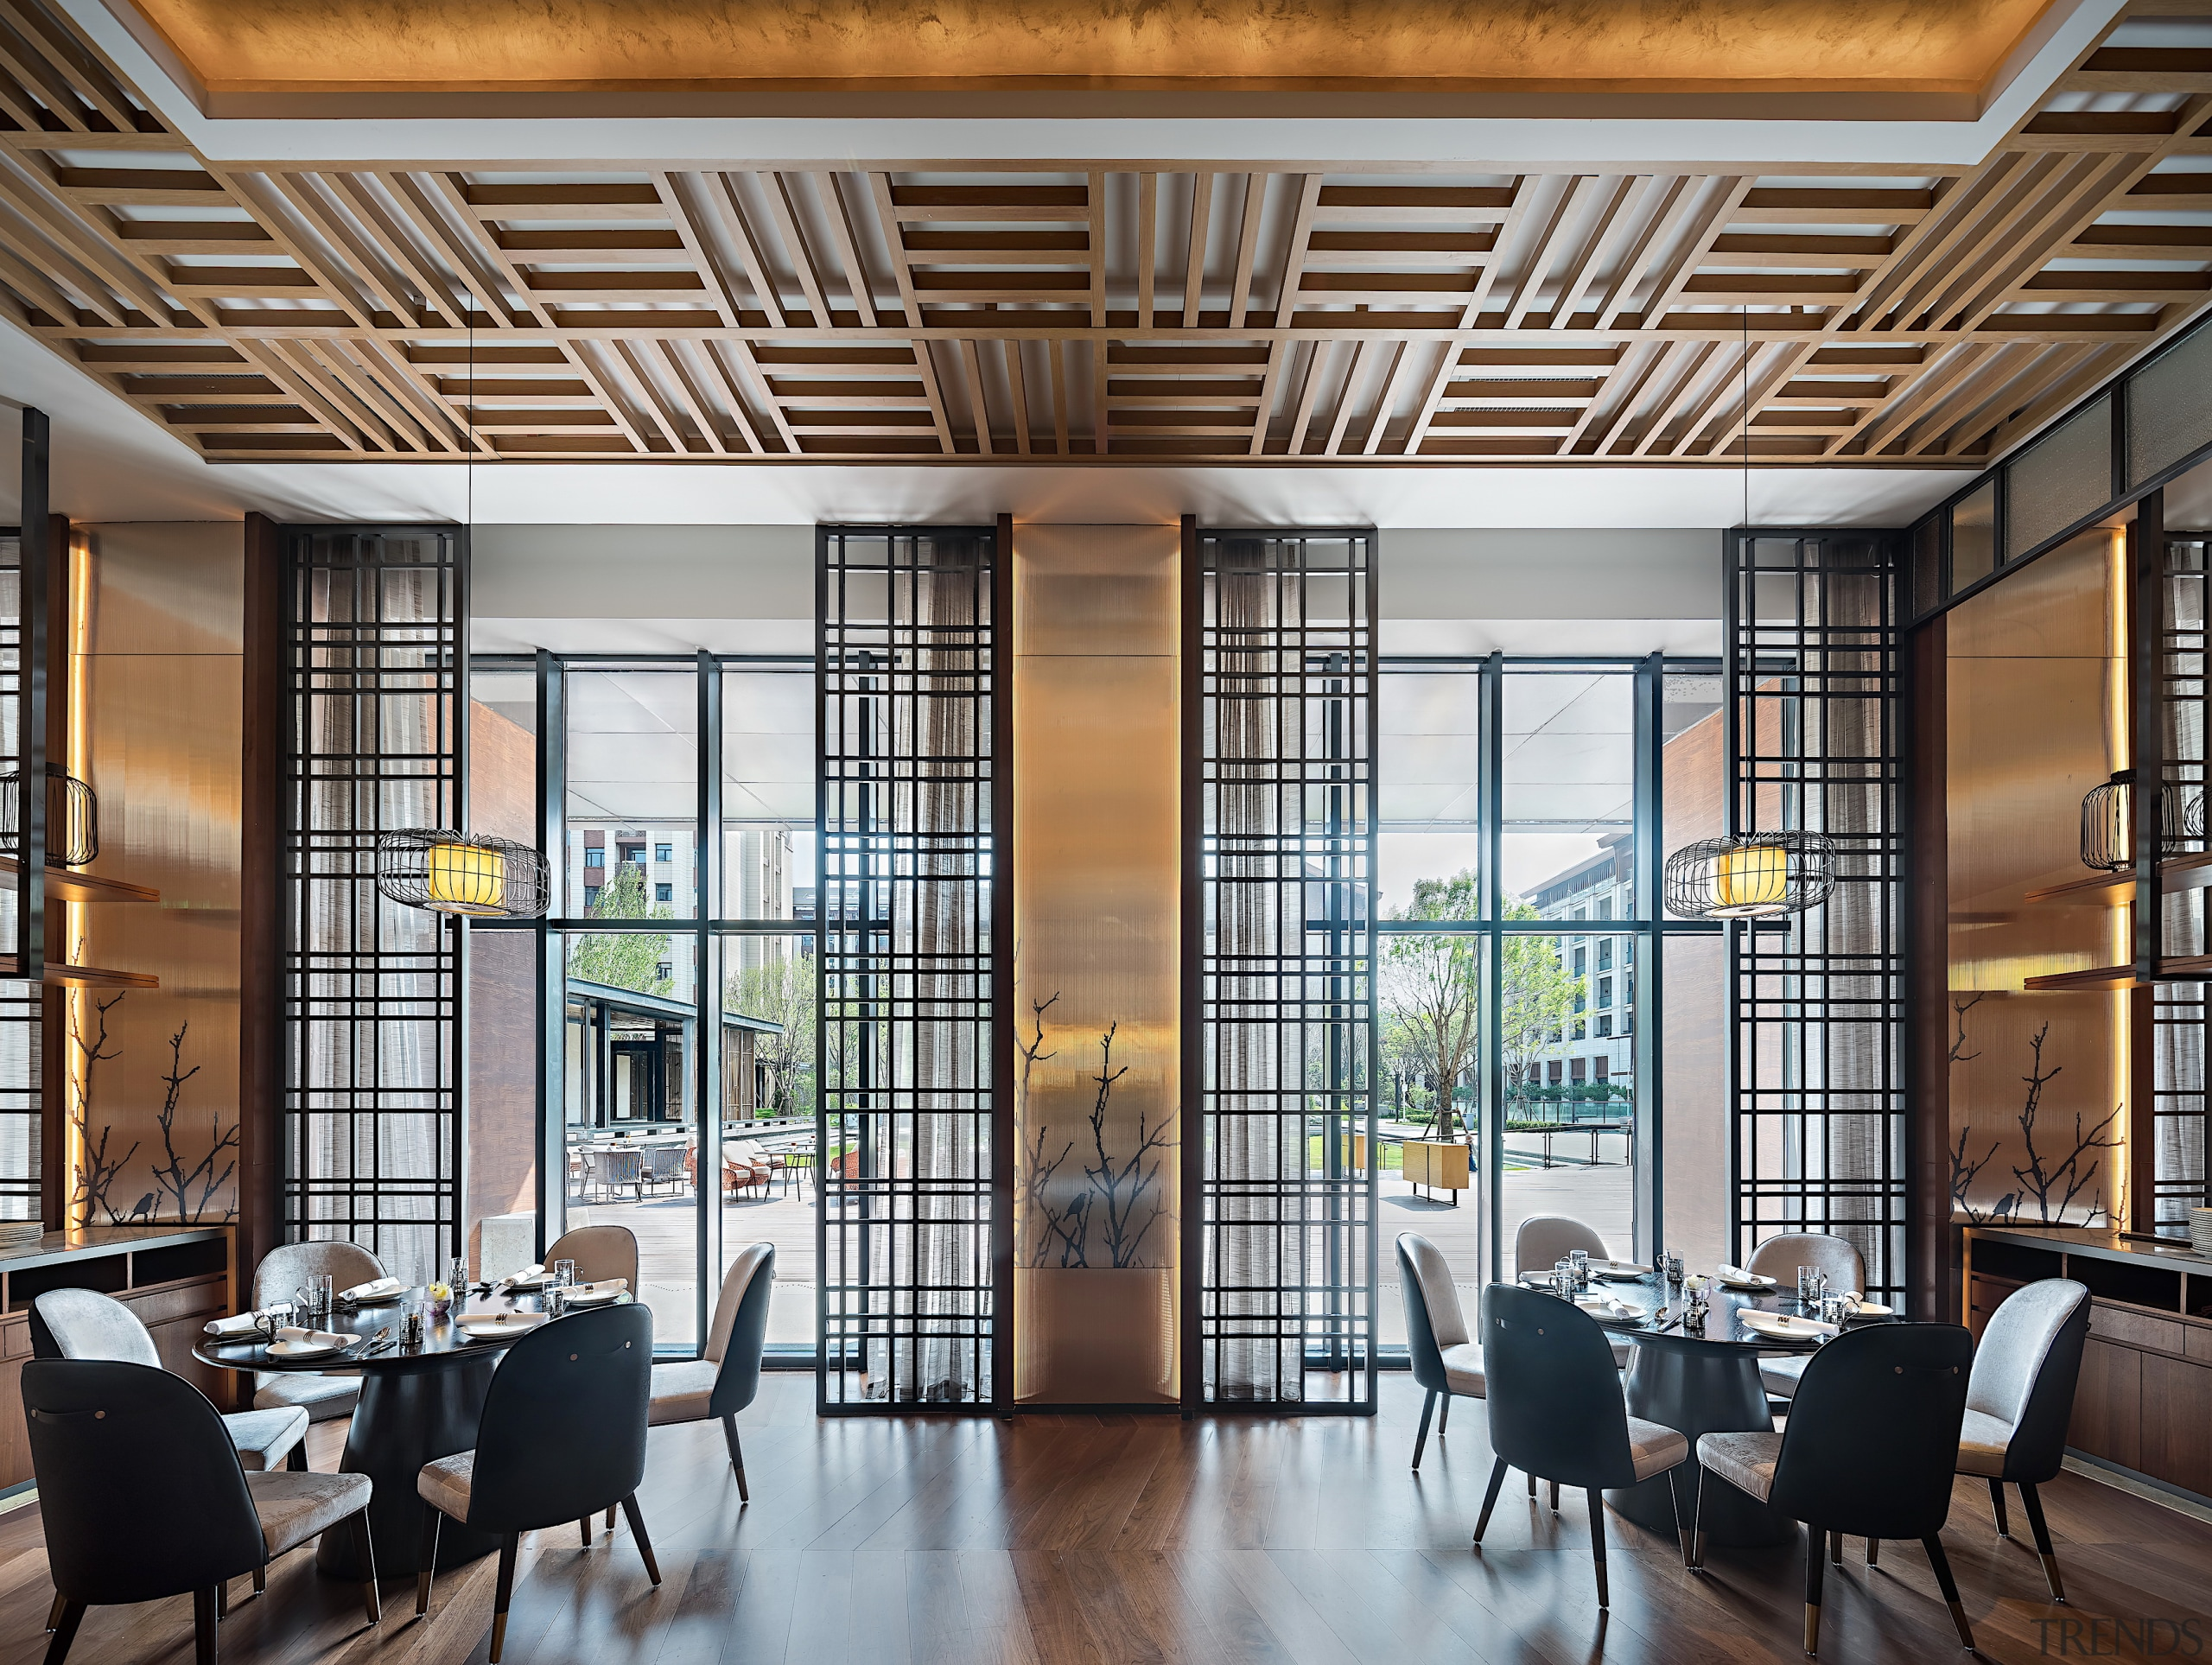 The Chinese Restaurant at the Hyatt is inspired